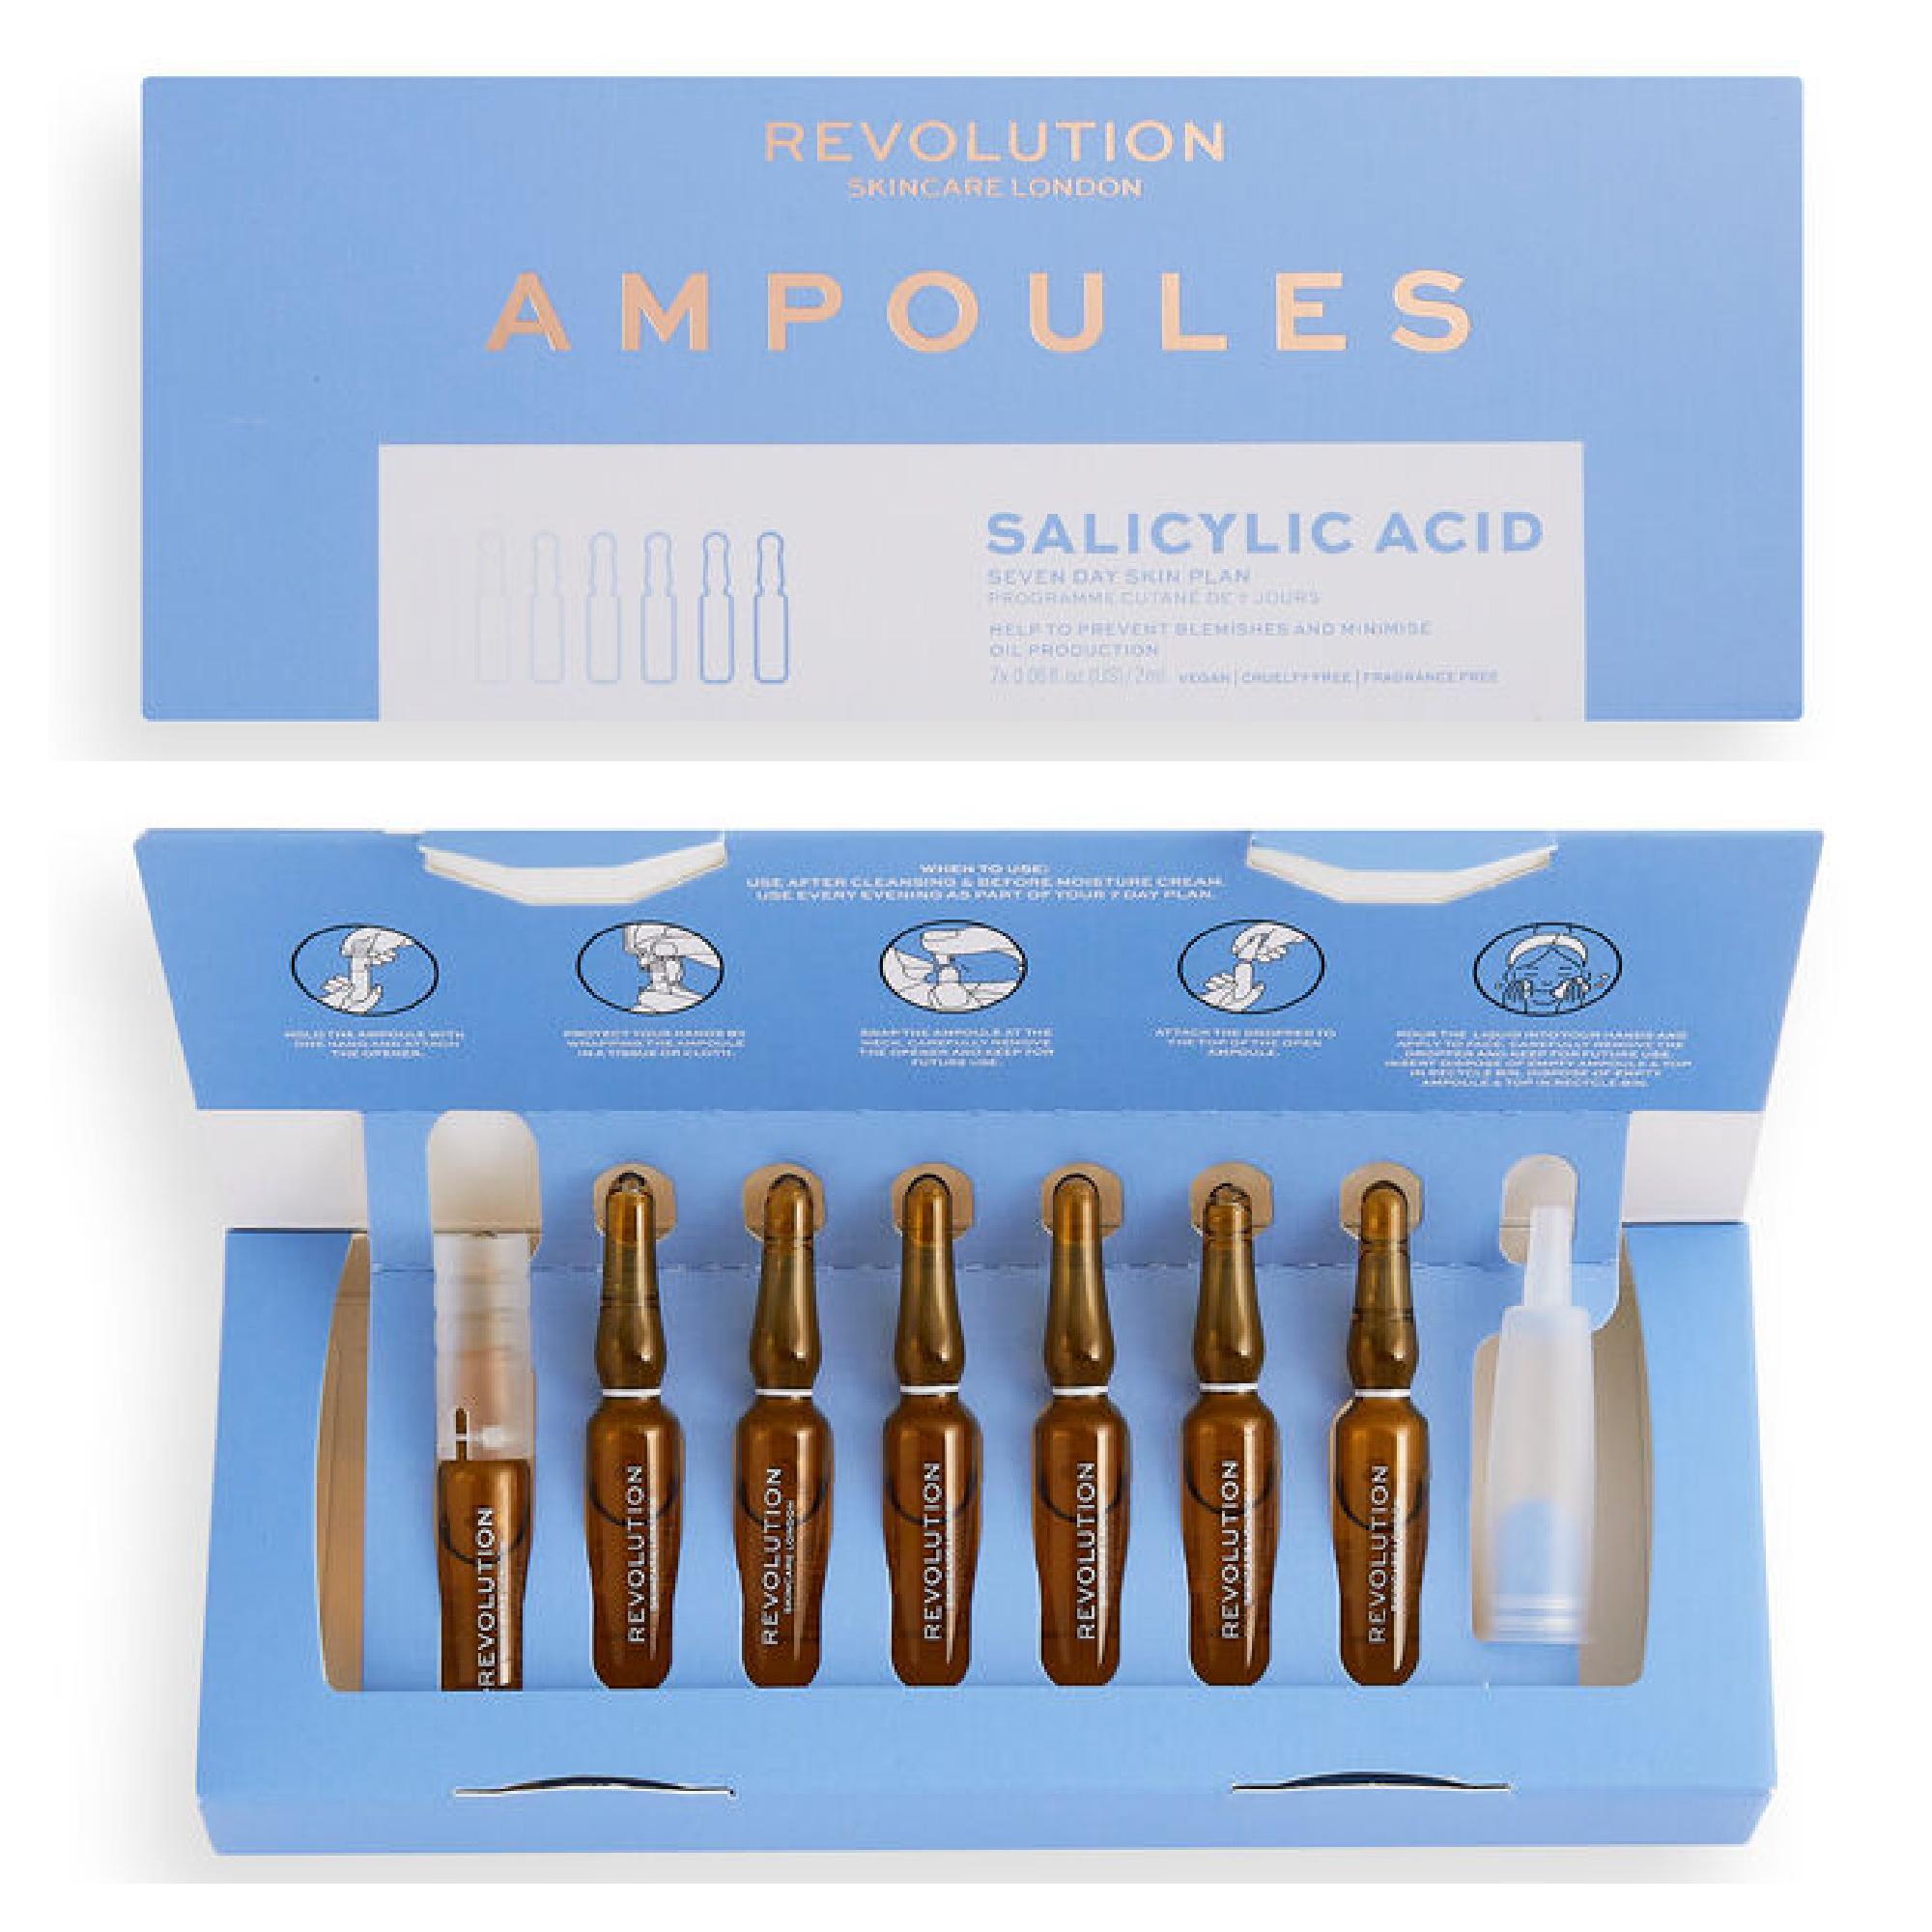 Revolution Skincare Salicylic Acid Ampoules 7 Day Skin Plan 1